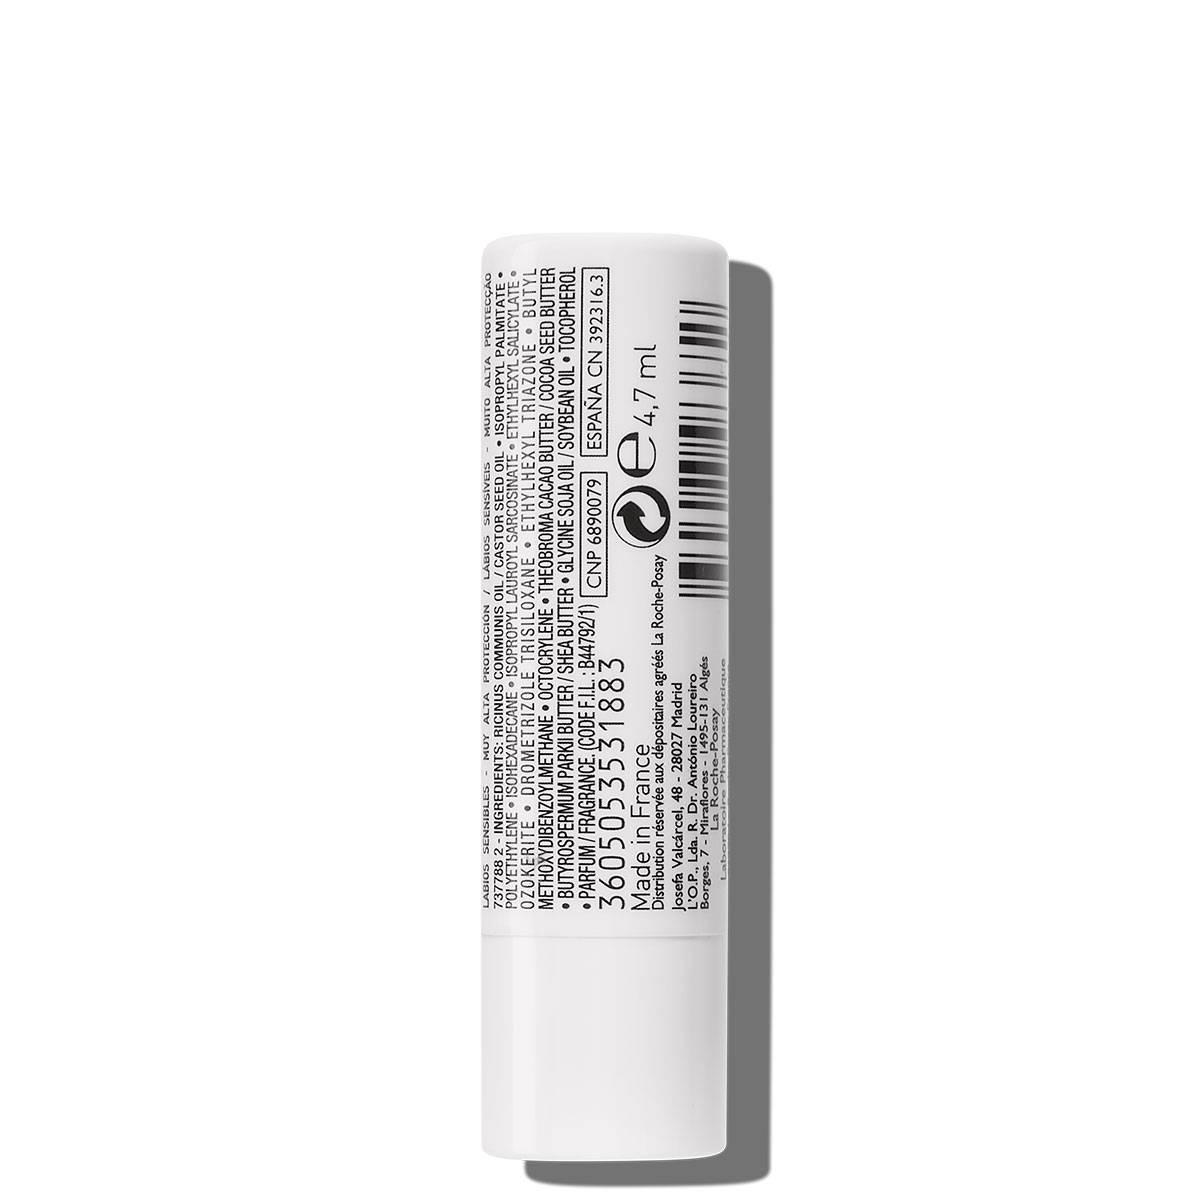 La Roche Posay ProduktSide Sol Anthelios XL Læbestift Spf50 Sensitiv